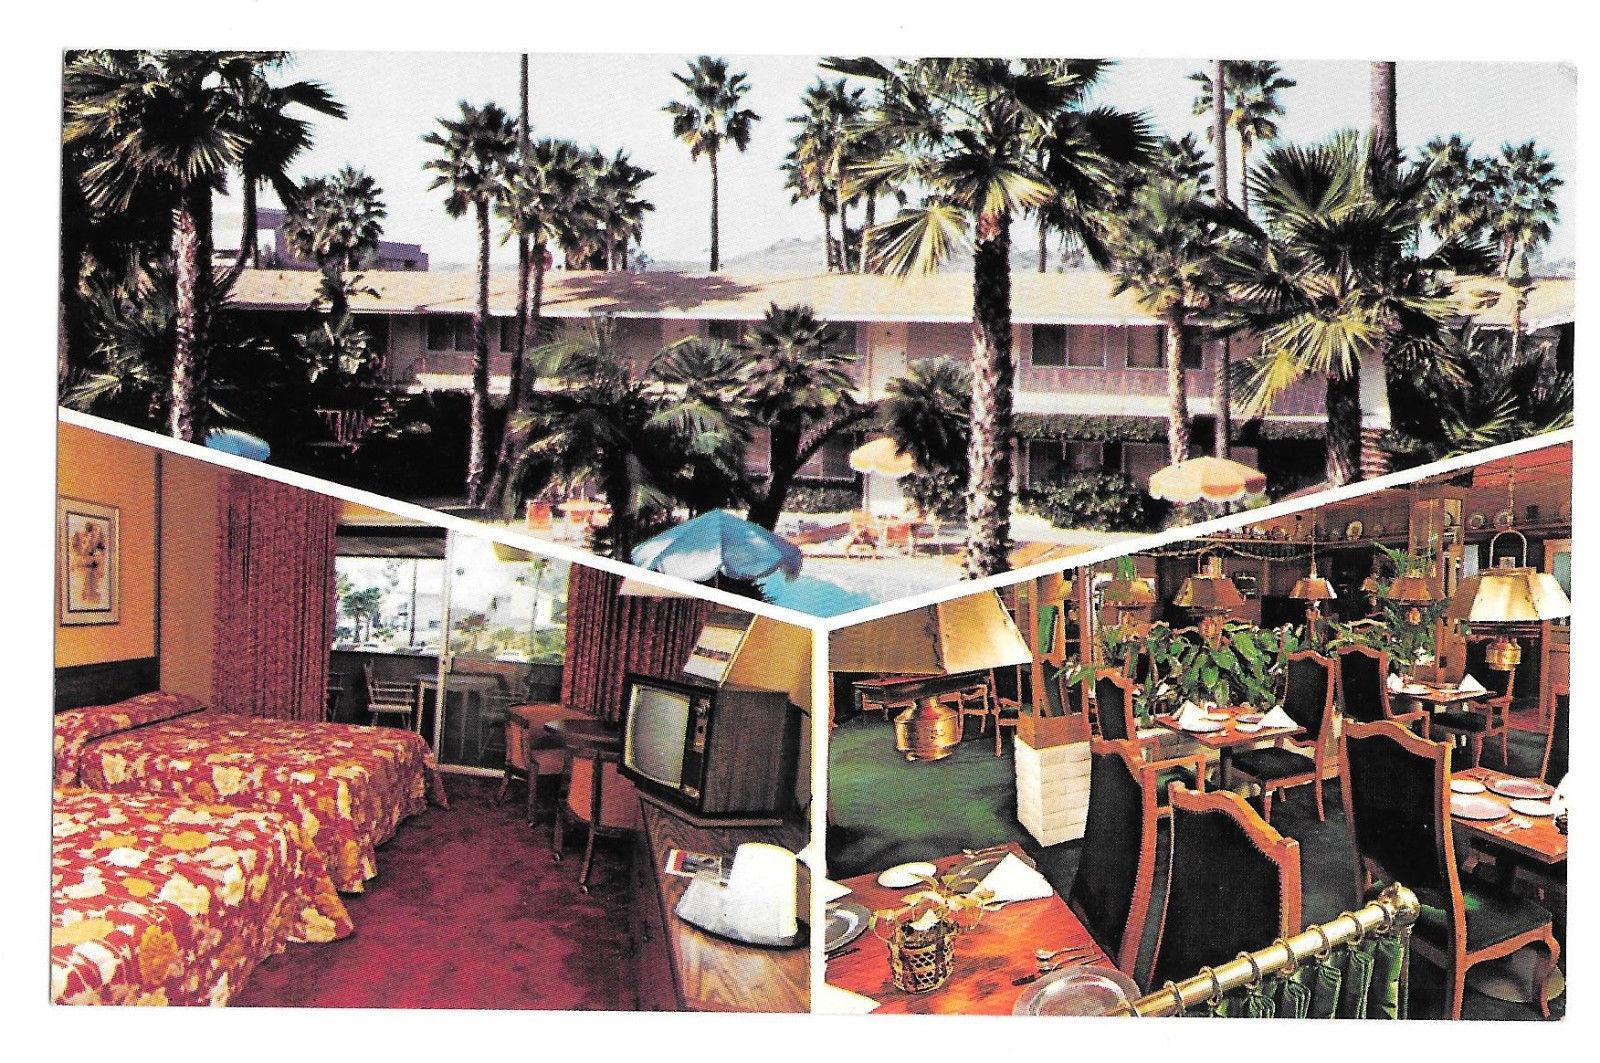 CA San Diego Kings Inn Motel Hotel Multiview California Vtg Postcard